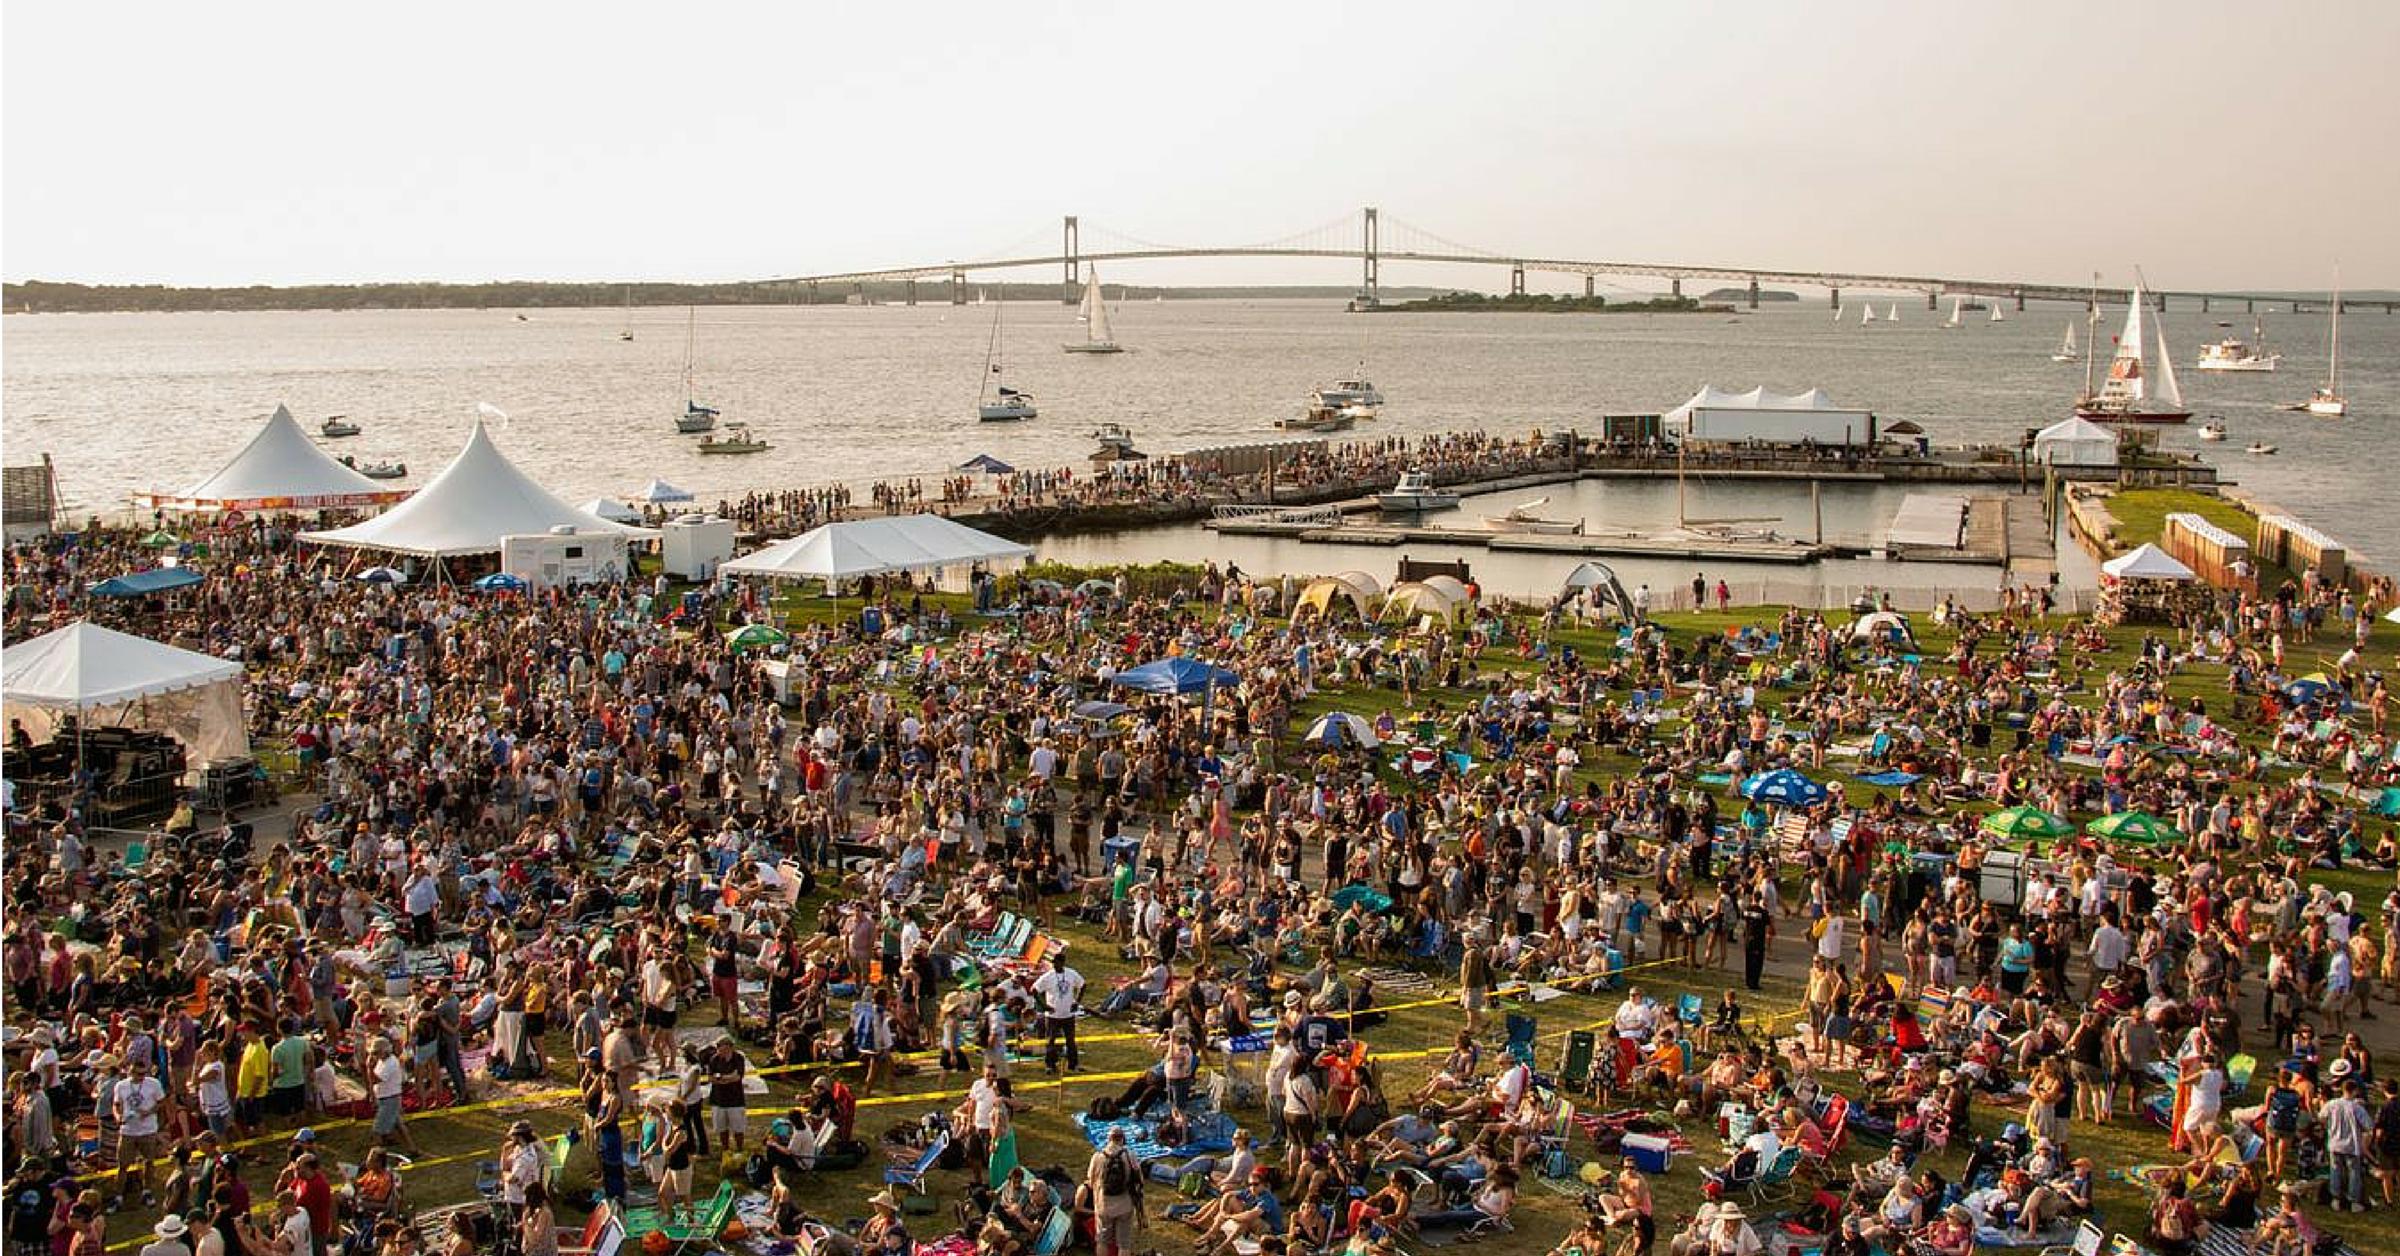 Newport Folk Festival 2016 Preview: How to do Newport Folk Fest by Boat